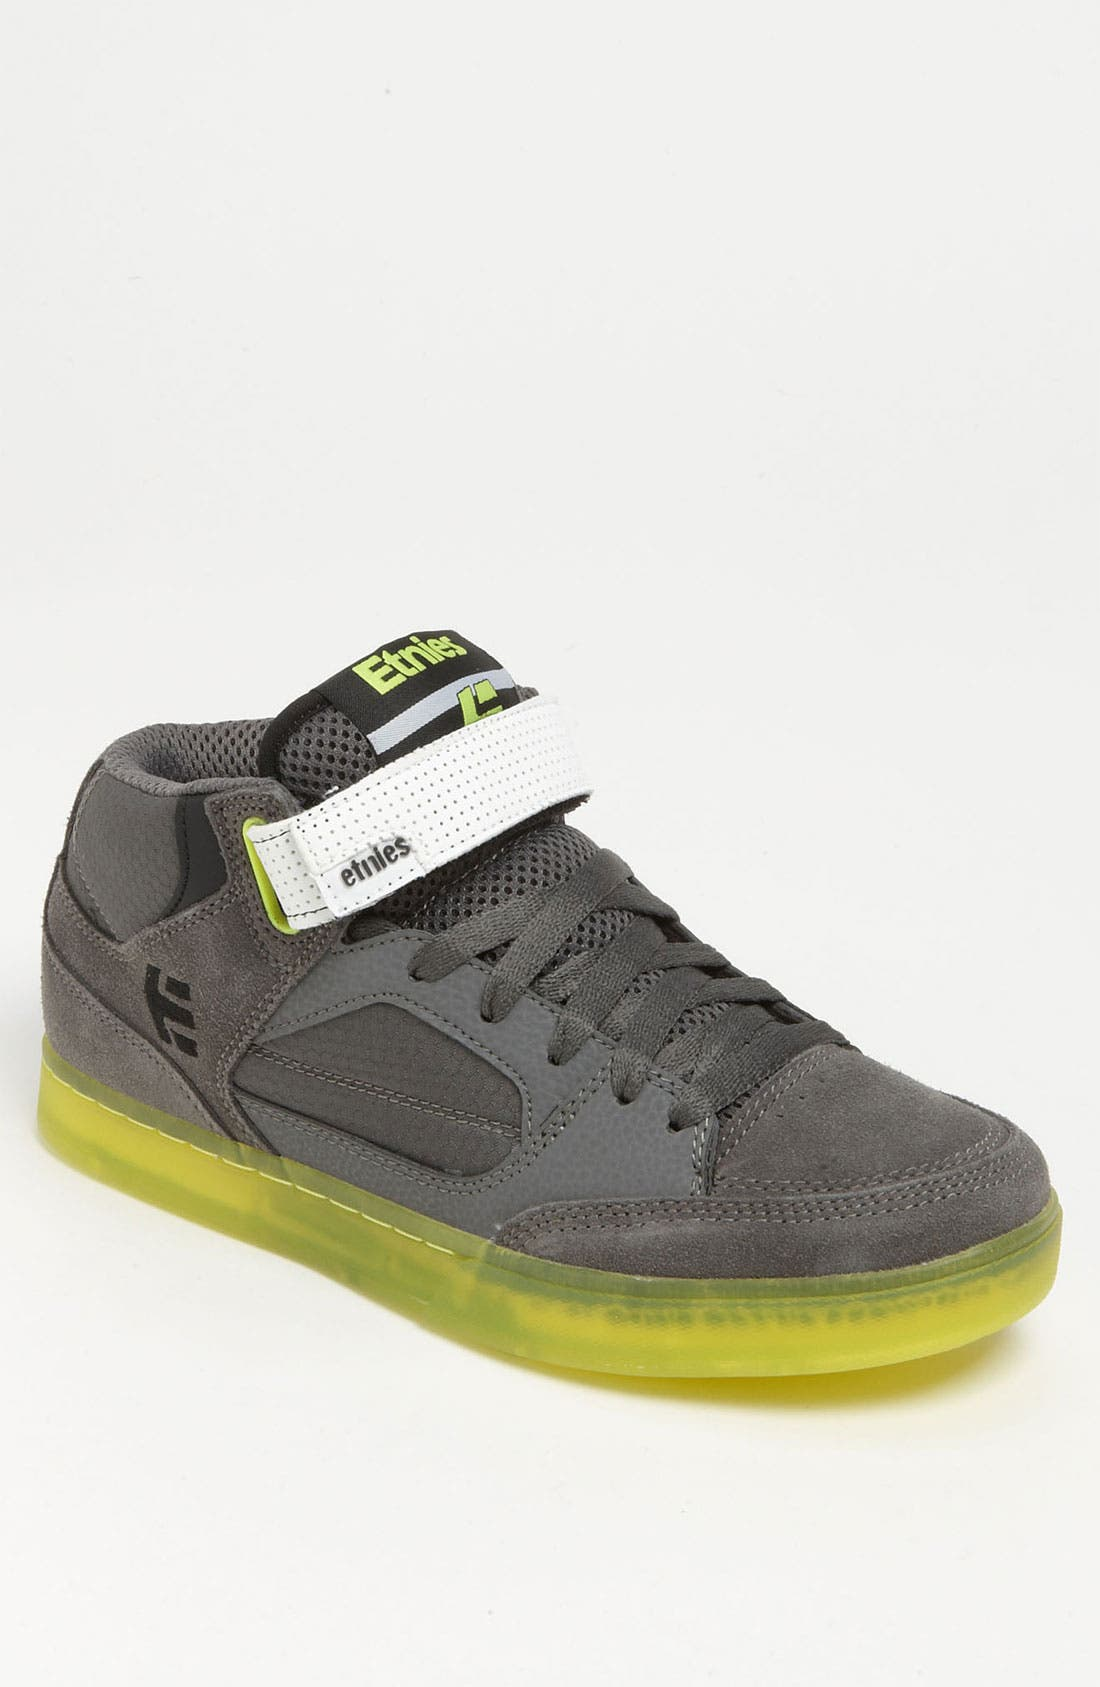 Main Image - Etnies 'Number Mid' Skate Shoe (Men)